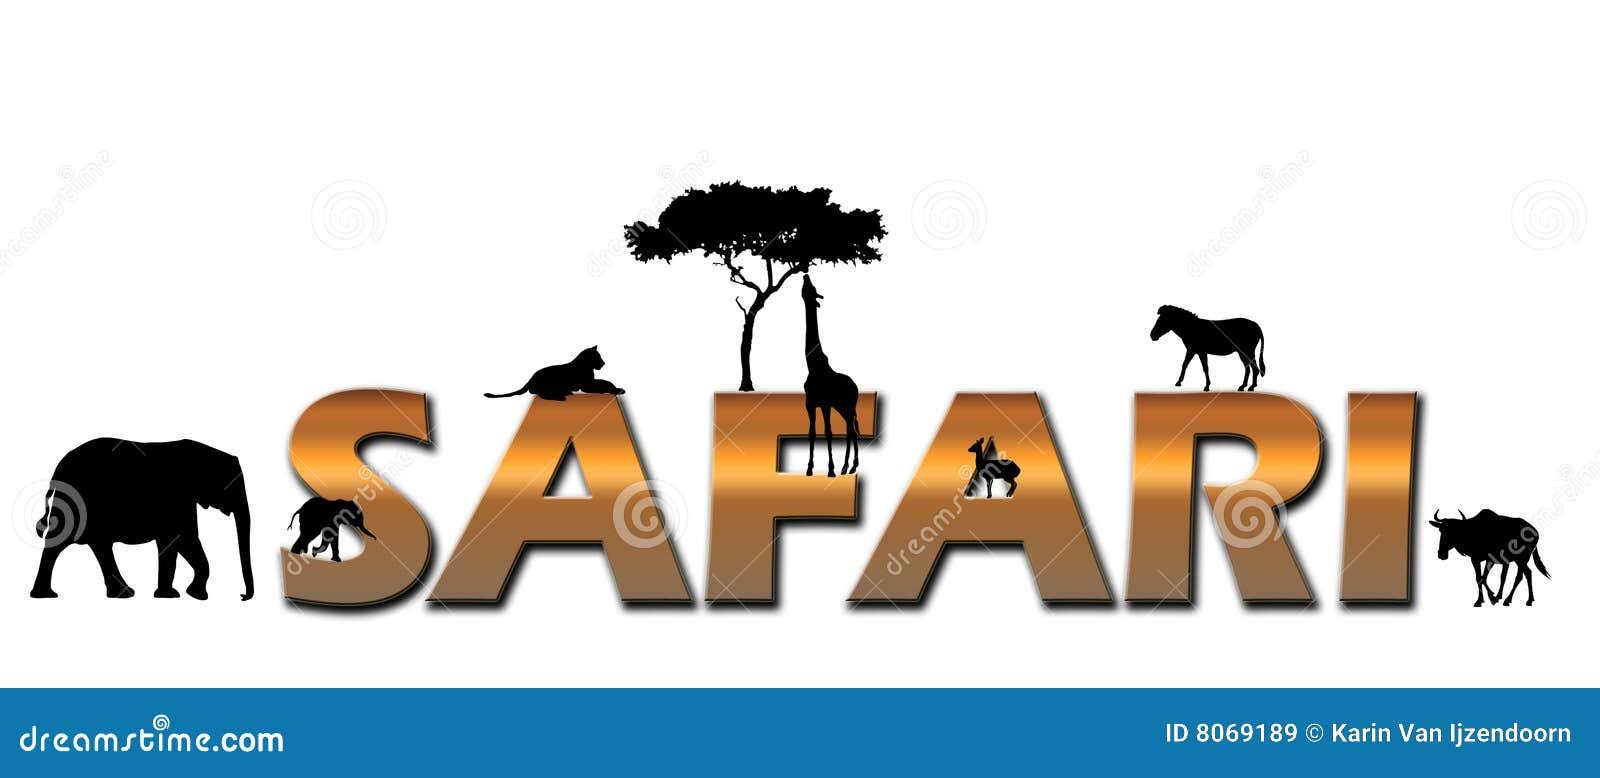 safari africain de logo illustration stock illustration du animaux 8069189. Black Bedroom Furniture Sets. Home Design Ideas